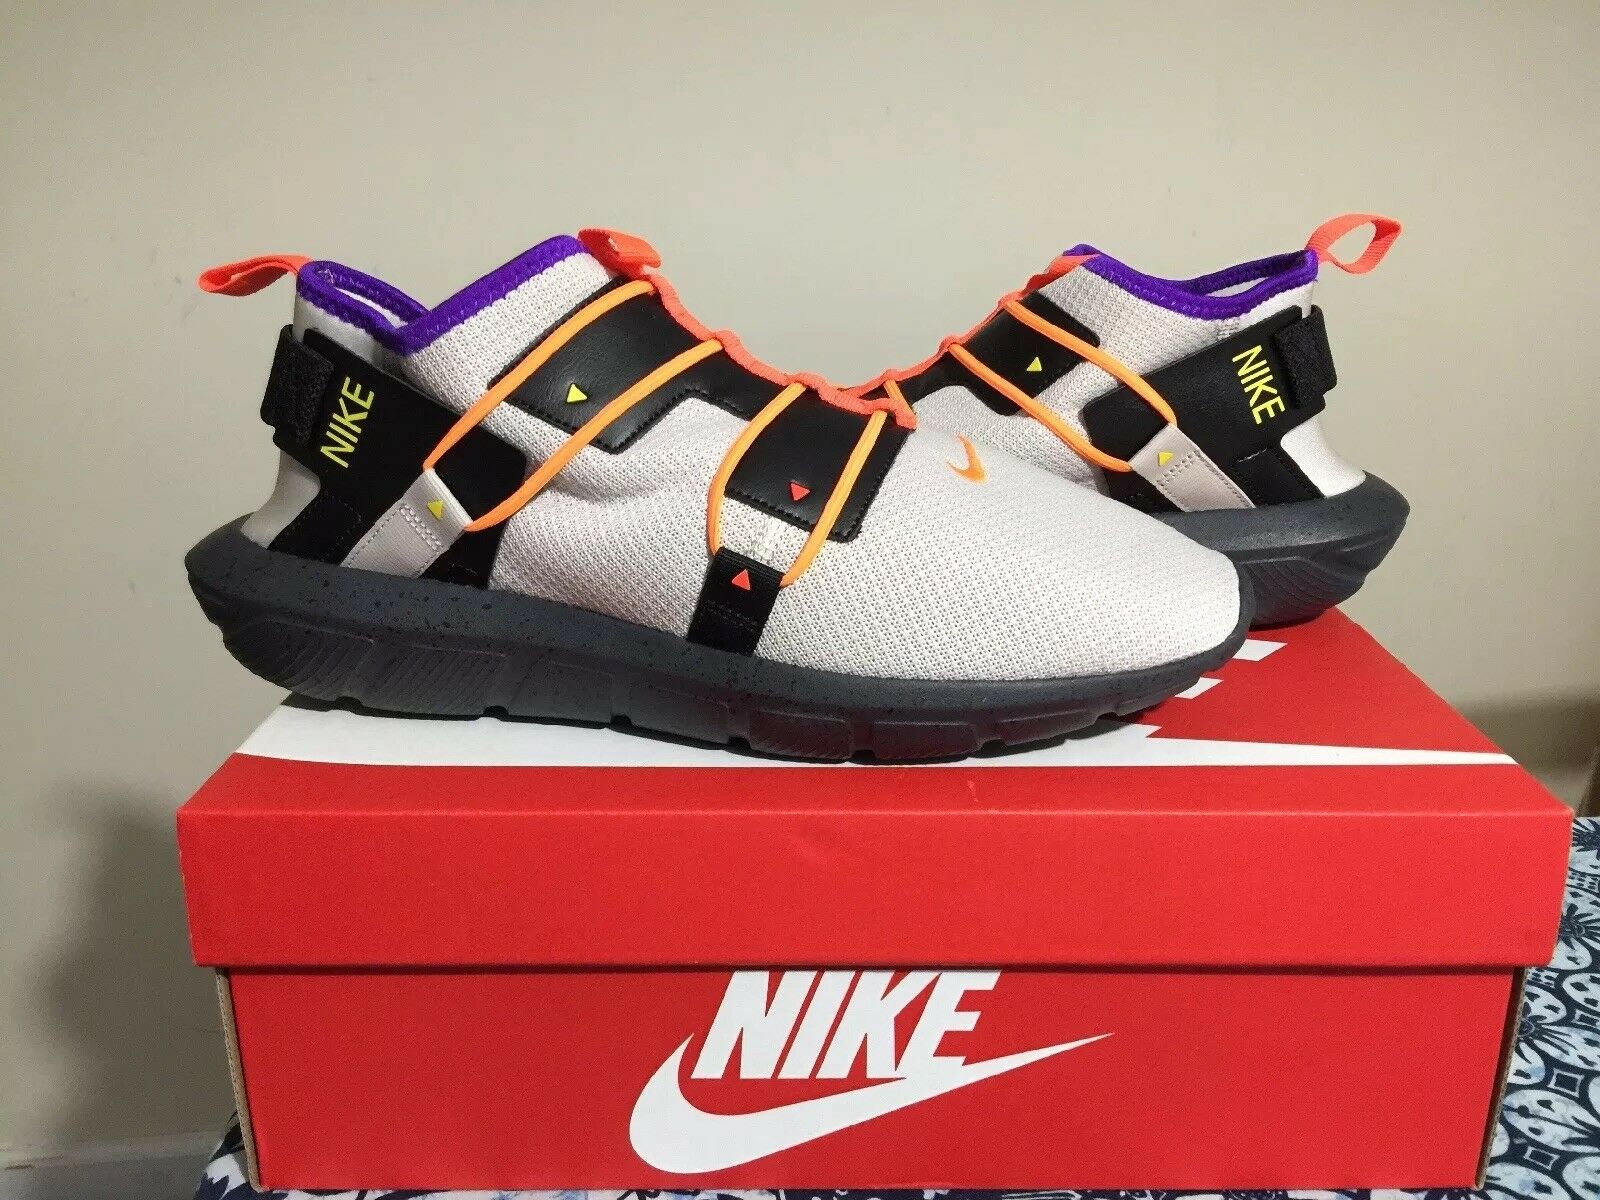 Men's Nike Vortak Casual shoes Desert Sand Total orange Black AA2194 001 Size 11